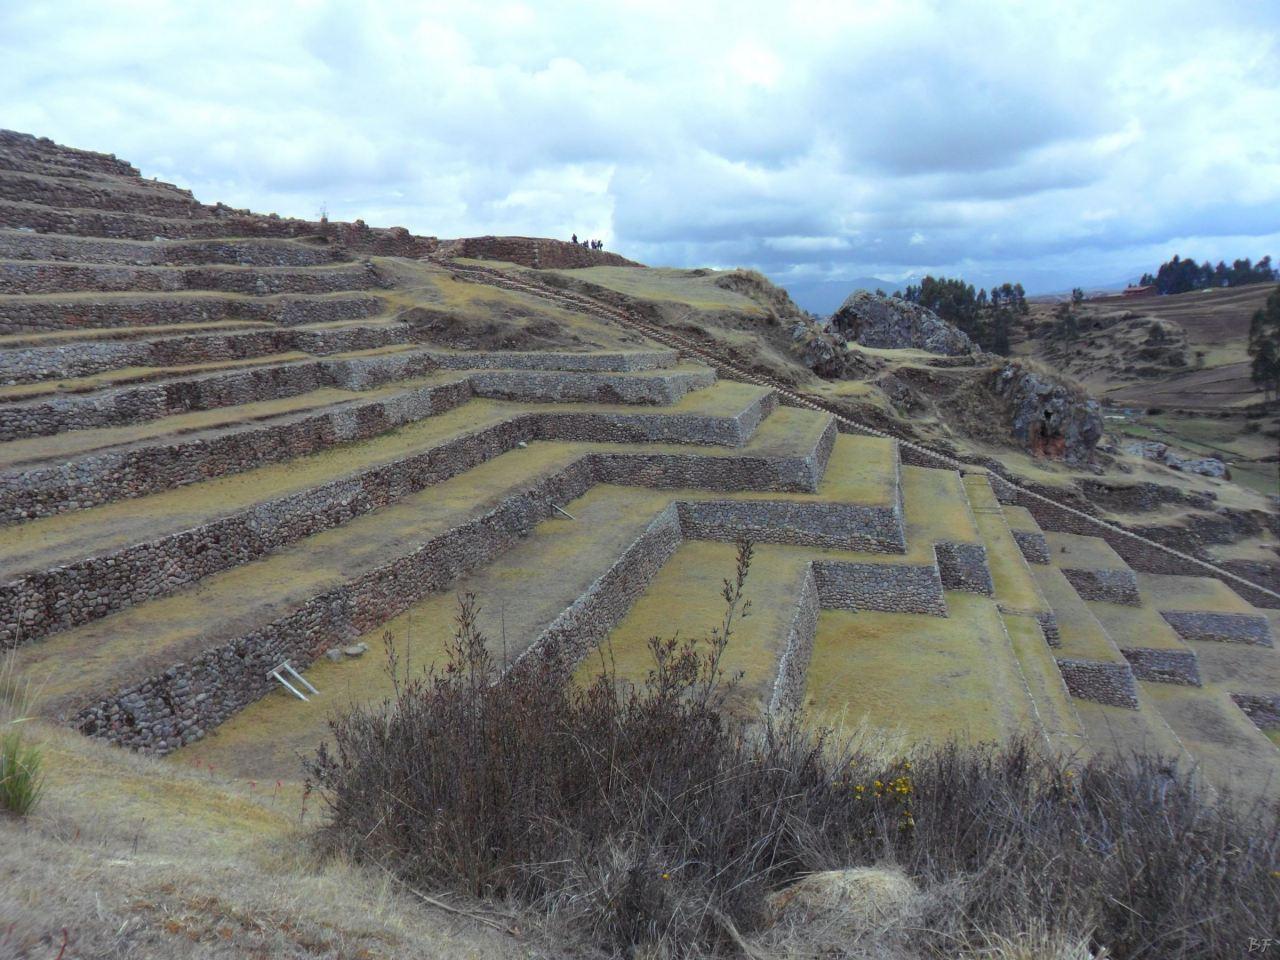 Chinchero-Mura-Poligonali-Piramide-Urubamba-Peru-83